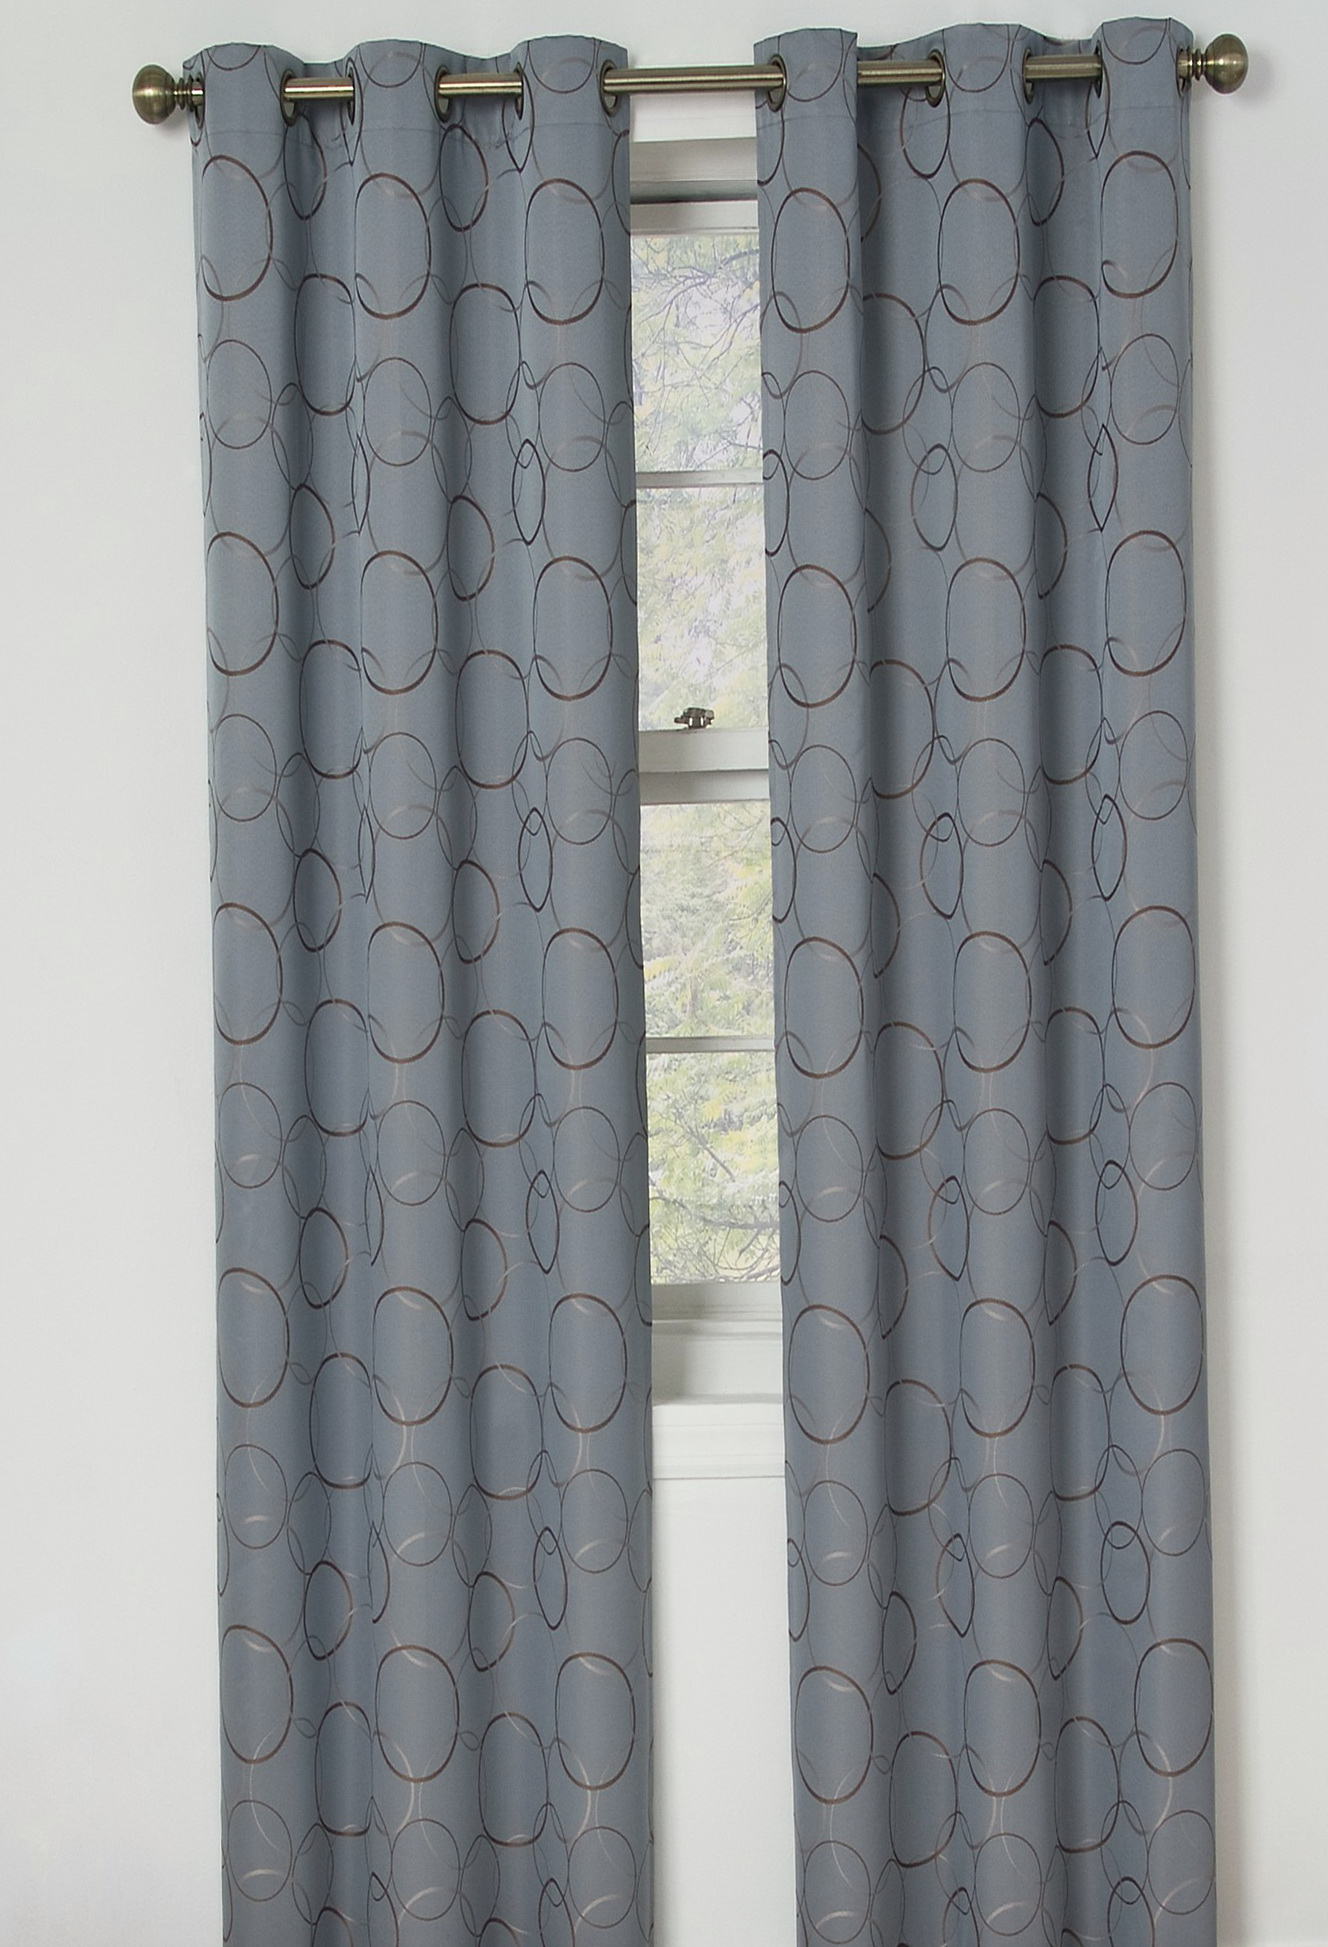 Gray Blackout Curtains Grommet